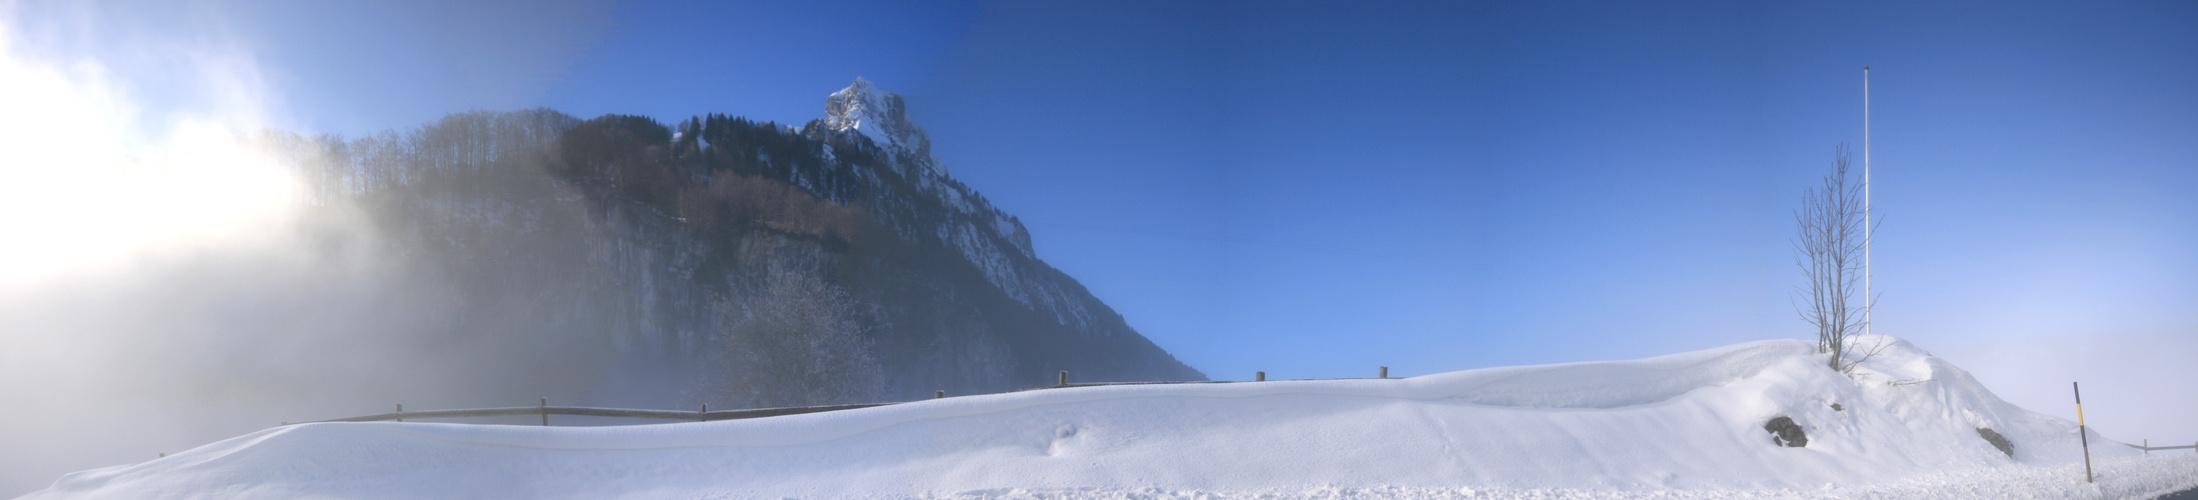 Winter 2011 in Seelisberg